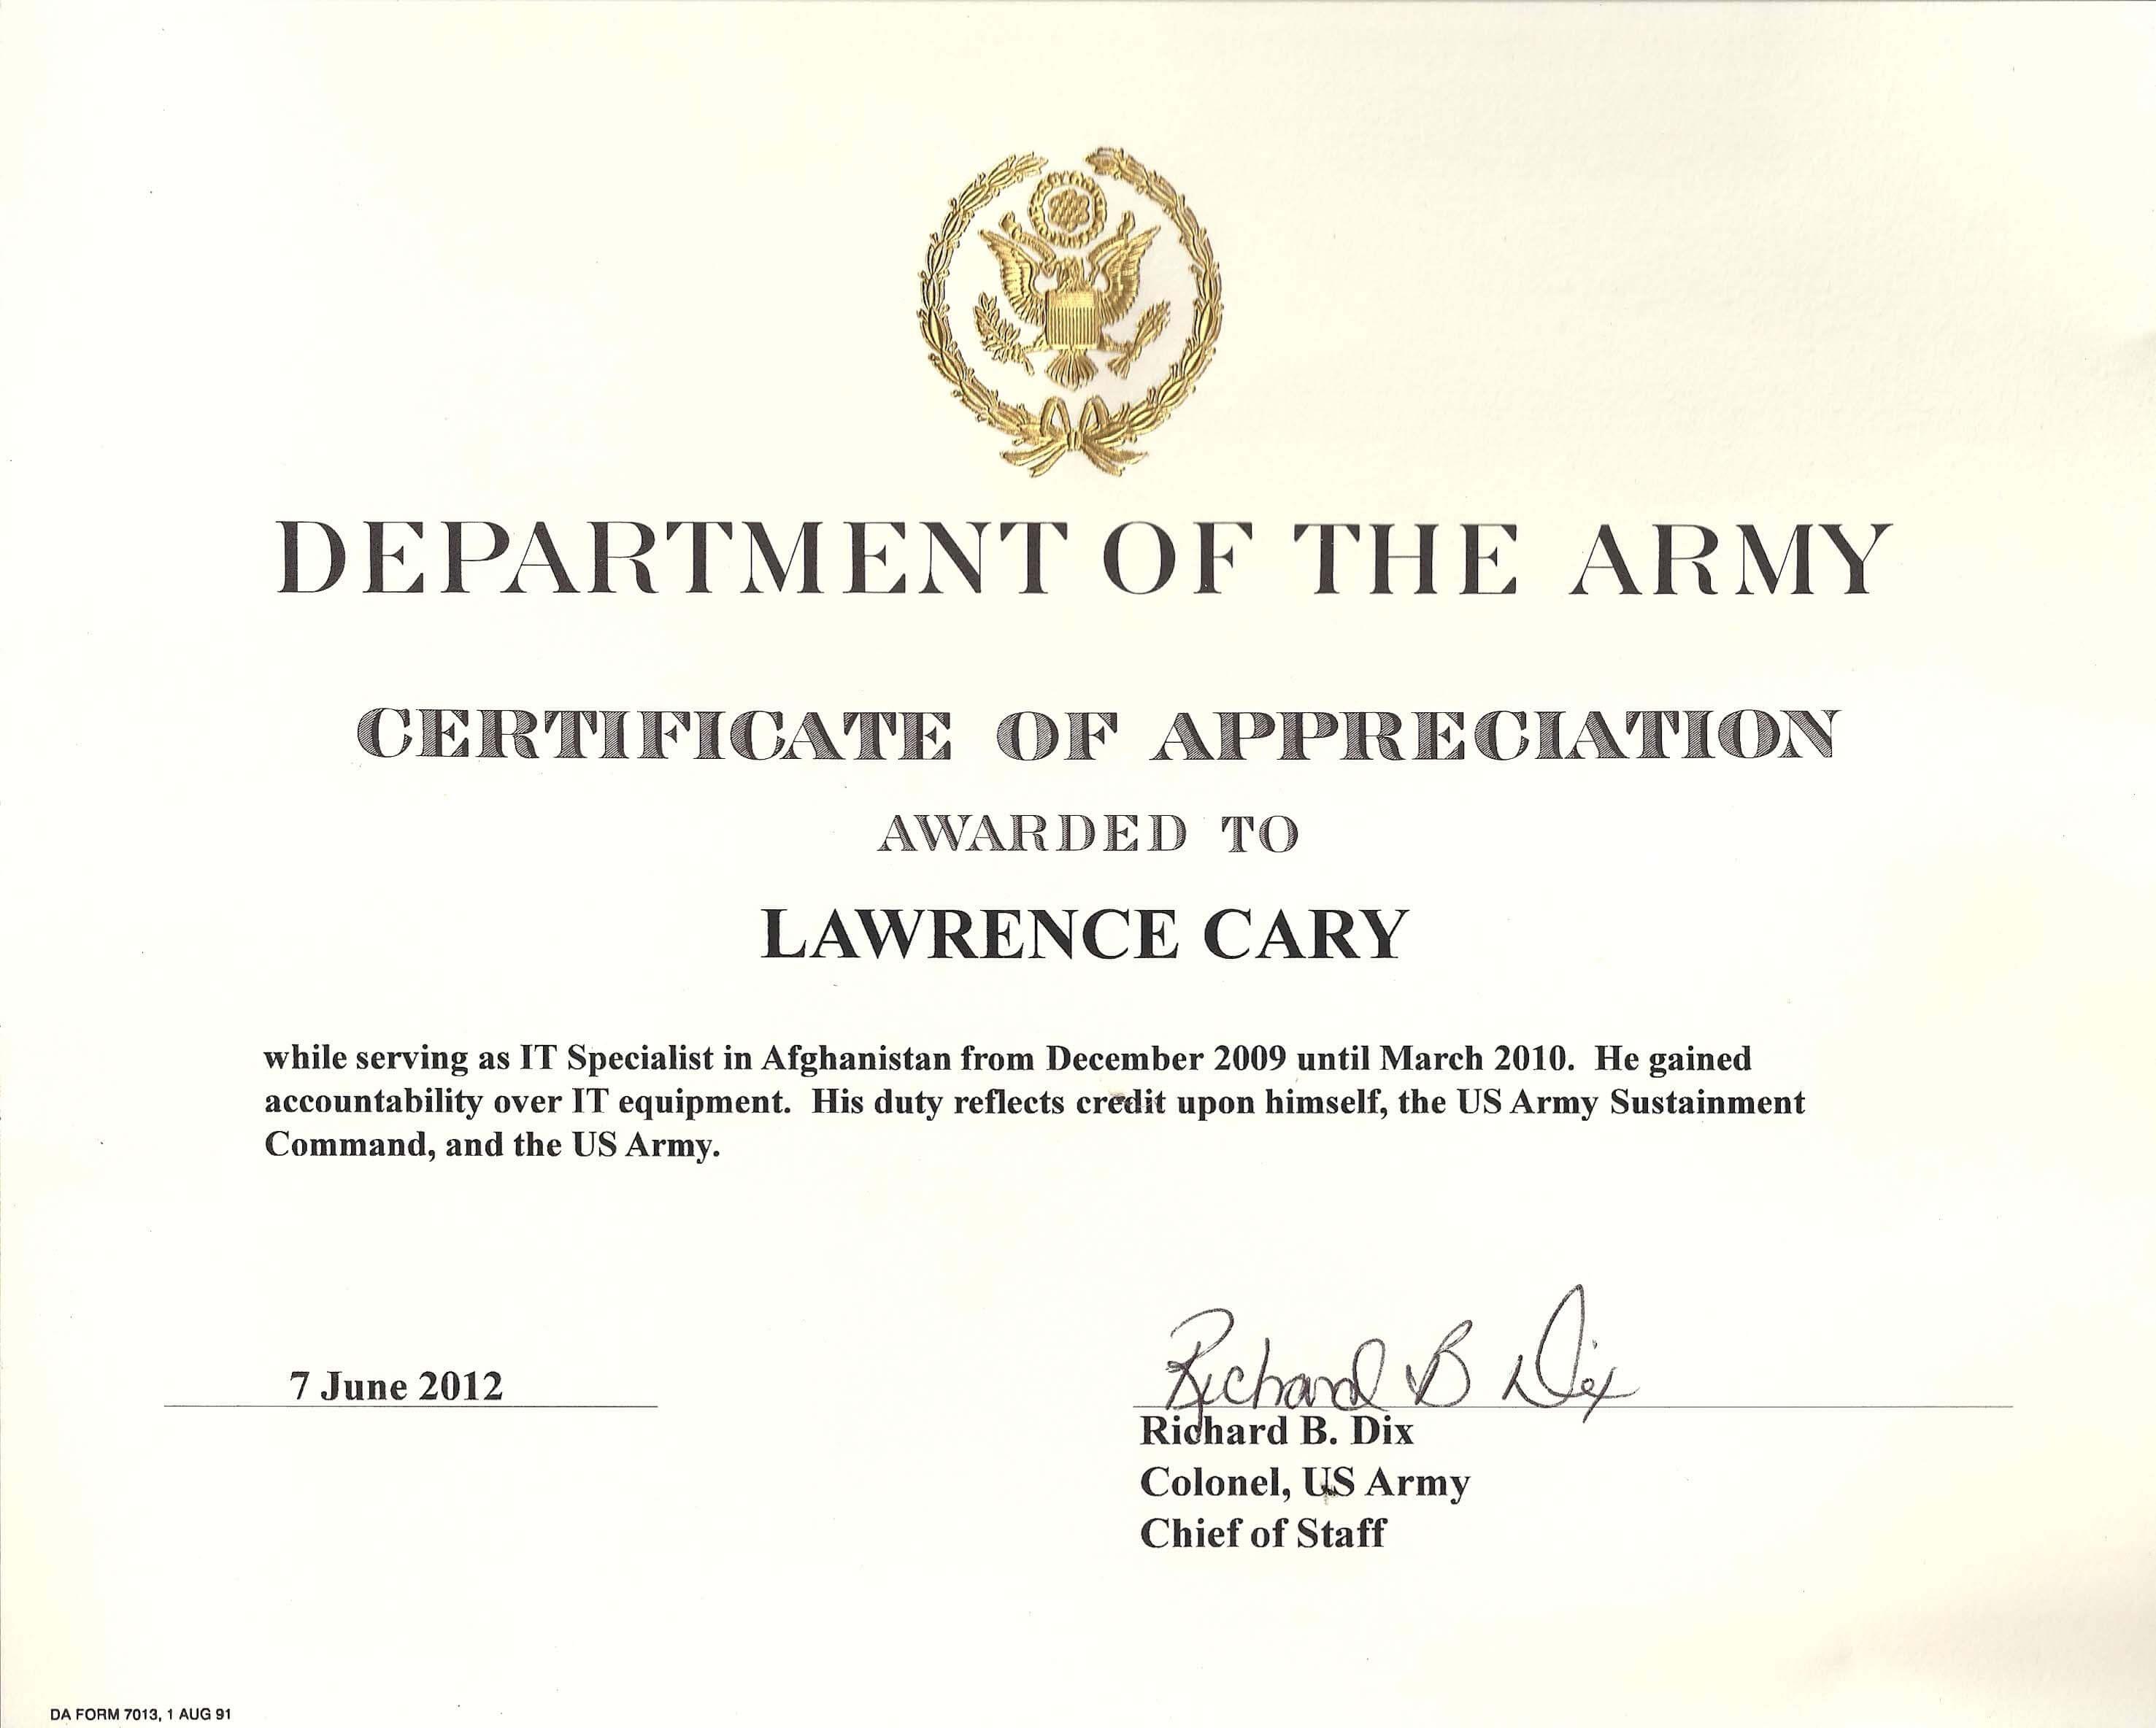 6+ Army Appreciation Certificate Templates - Pdf, Docx For Army Certificate Of Completion Template